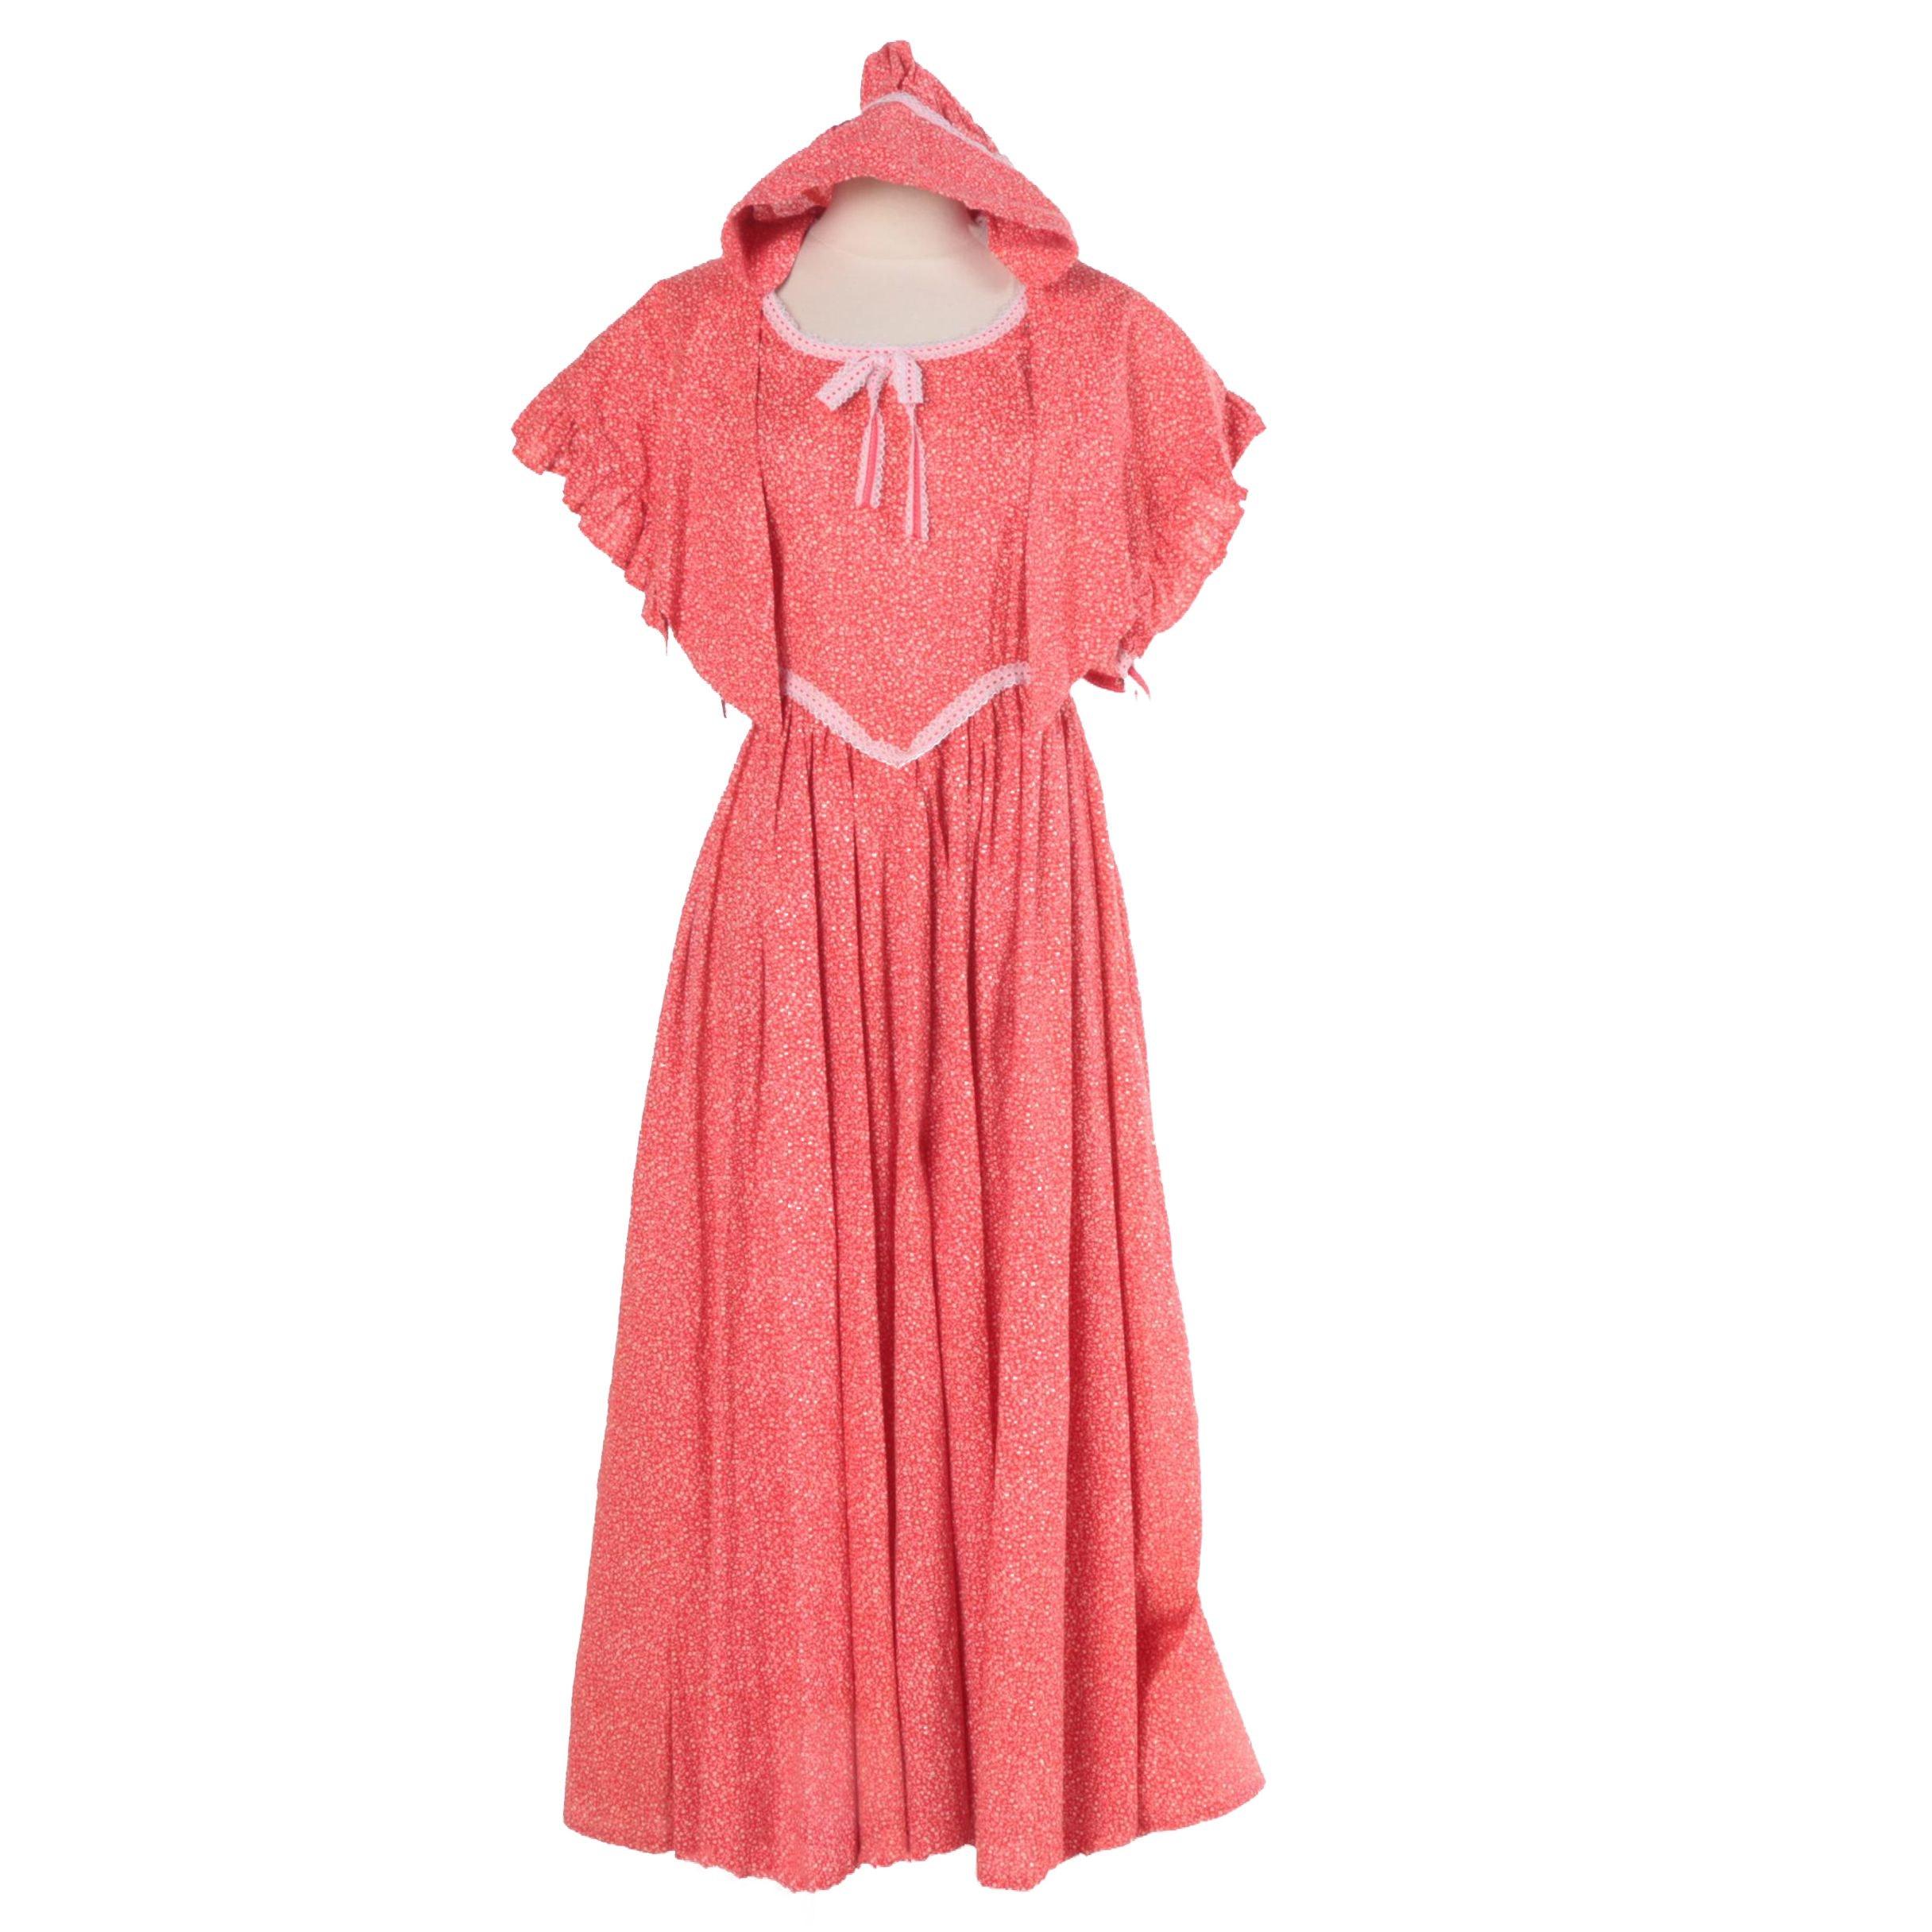 Women's Prairie Dress, Capelet and Bonnet